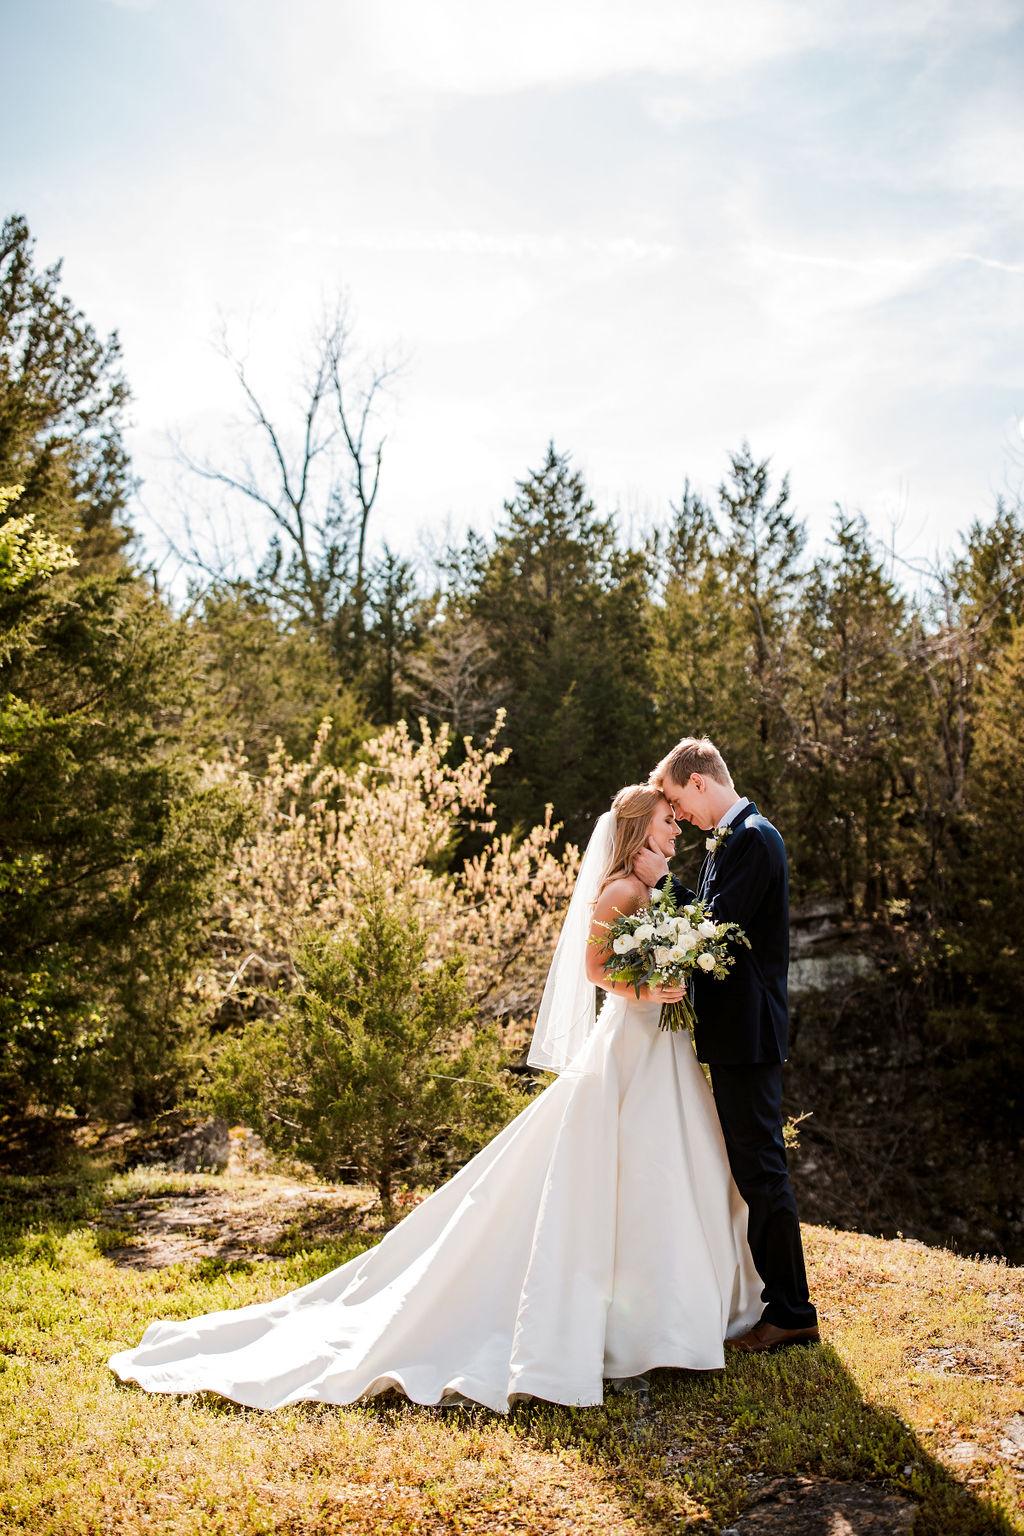 Nashvile Wedding Photography: Beautiful Graystone Quarry Wedding captured by John Myers Photography & Videography